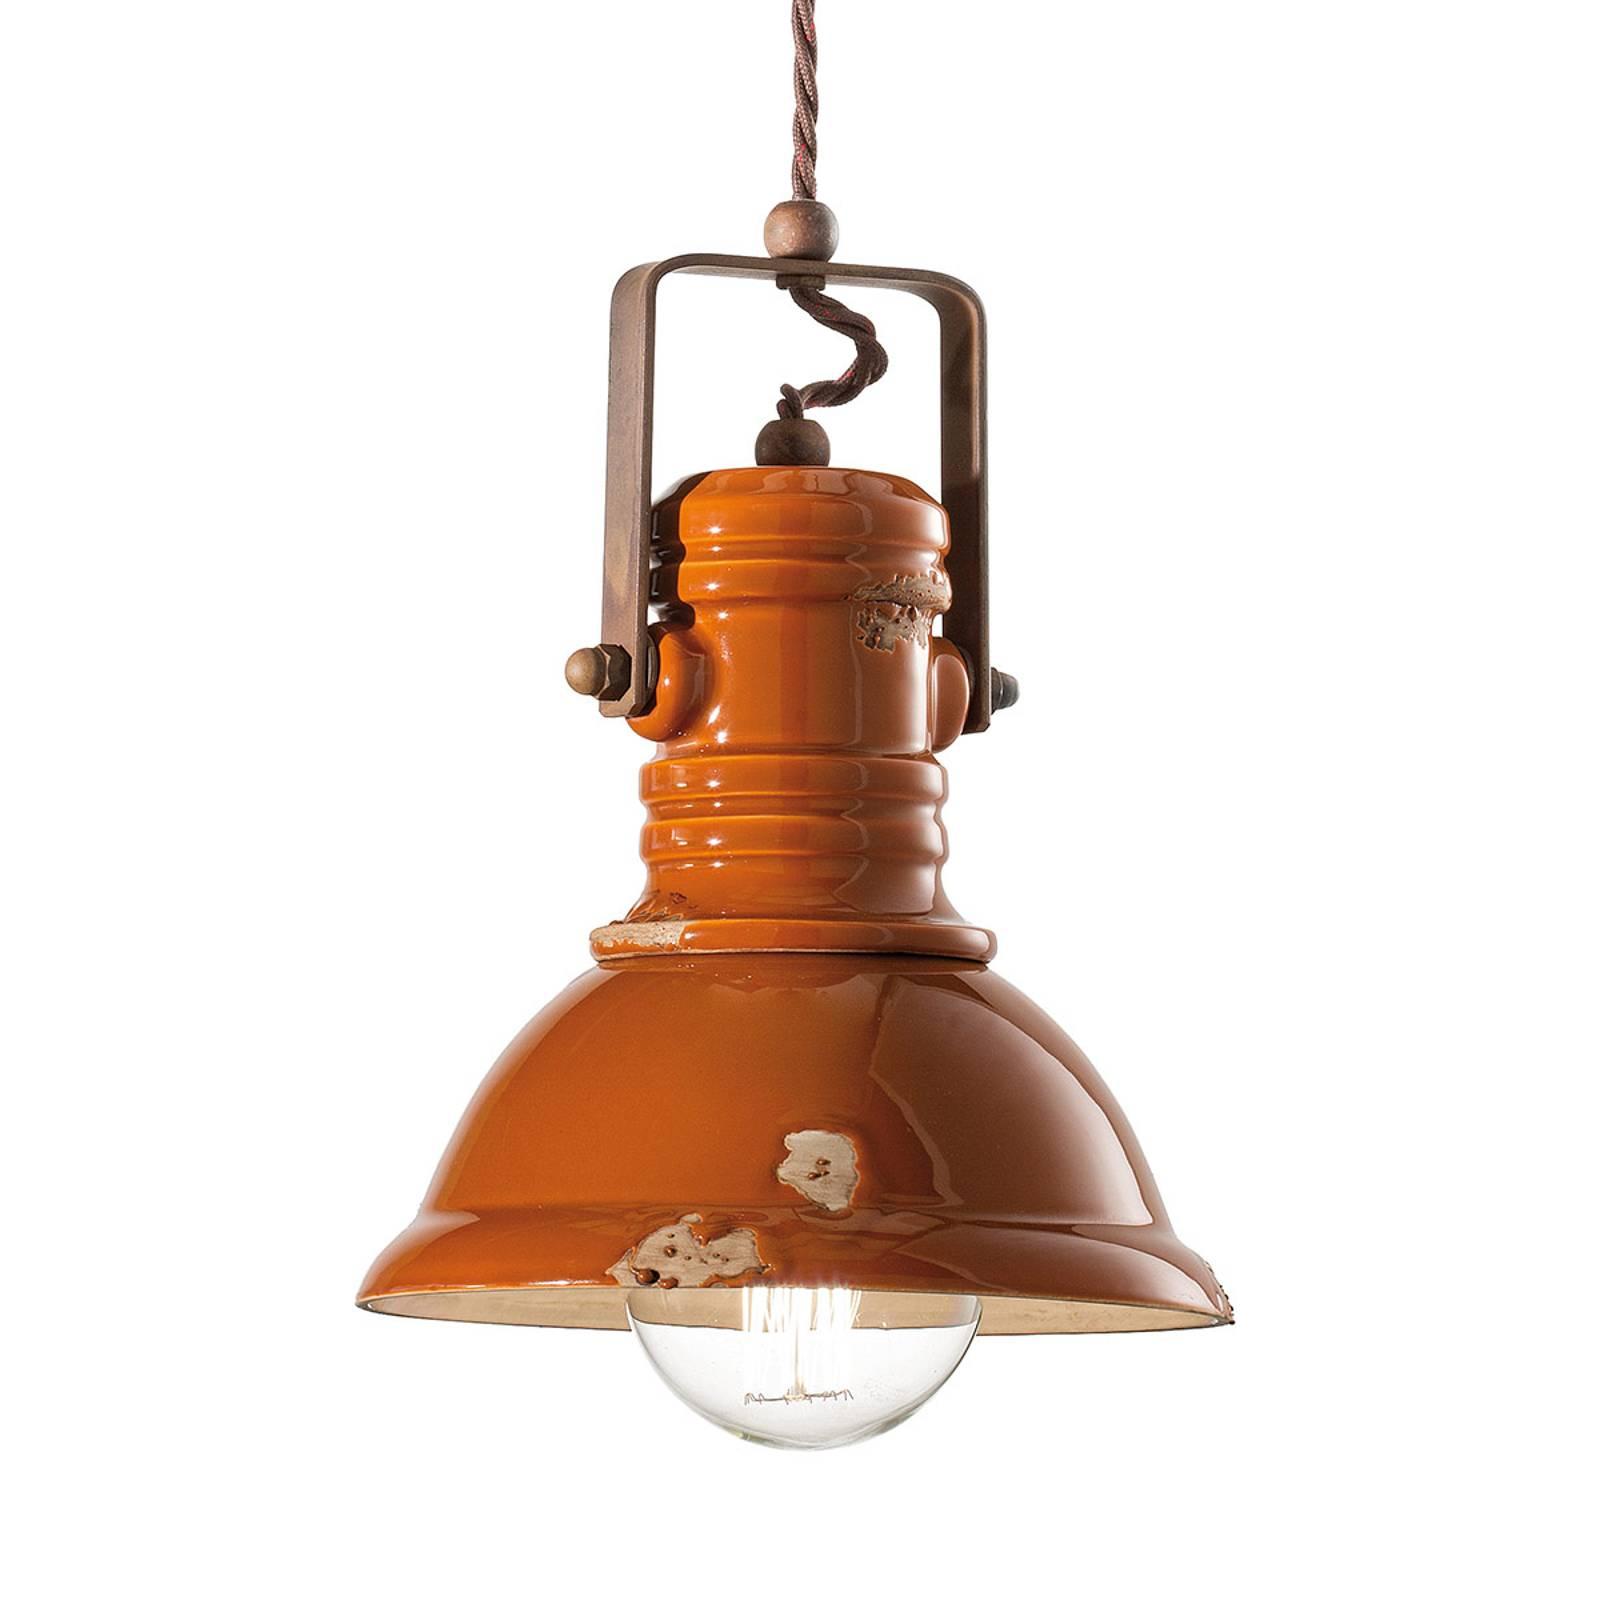 Hanglamp C1691 in industrieel design oranje